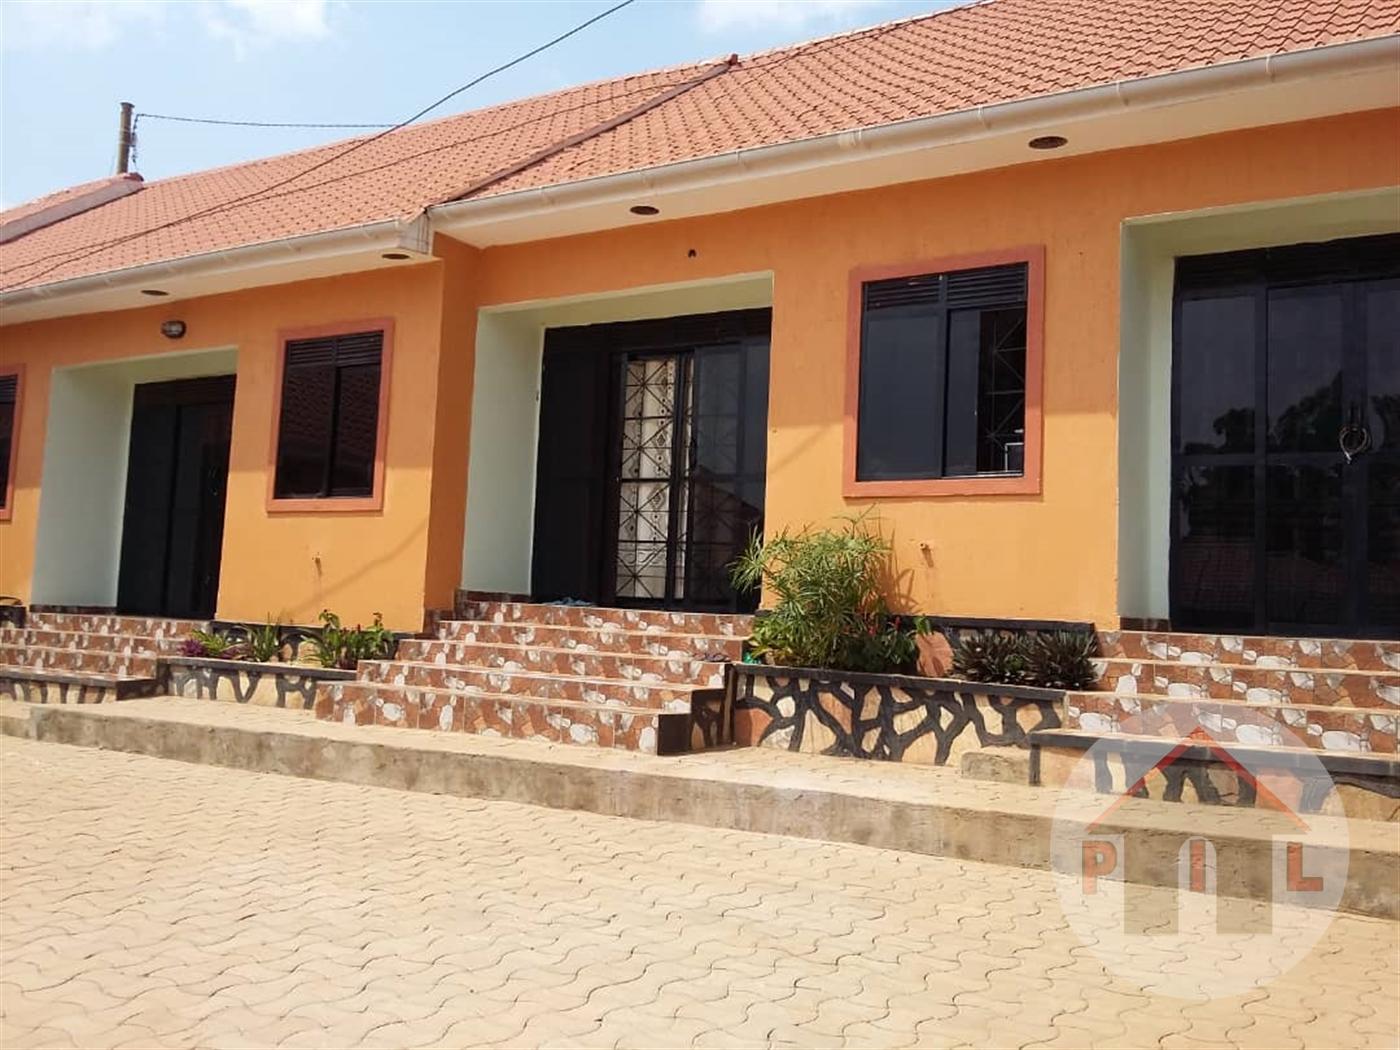 Rental units for sale in Kira Wakiso